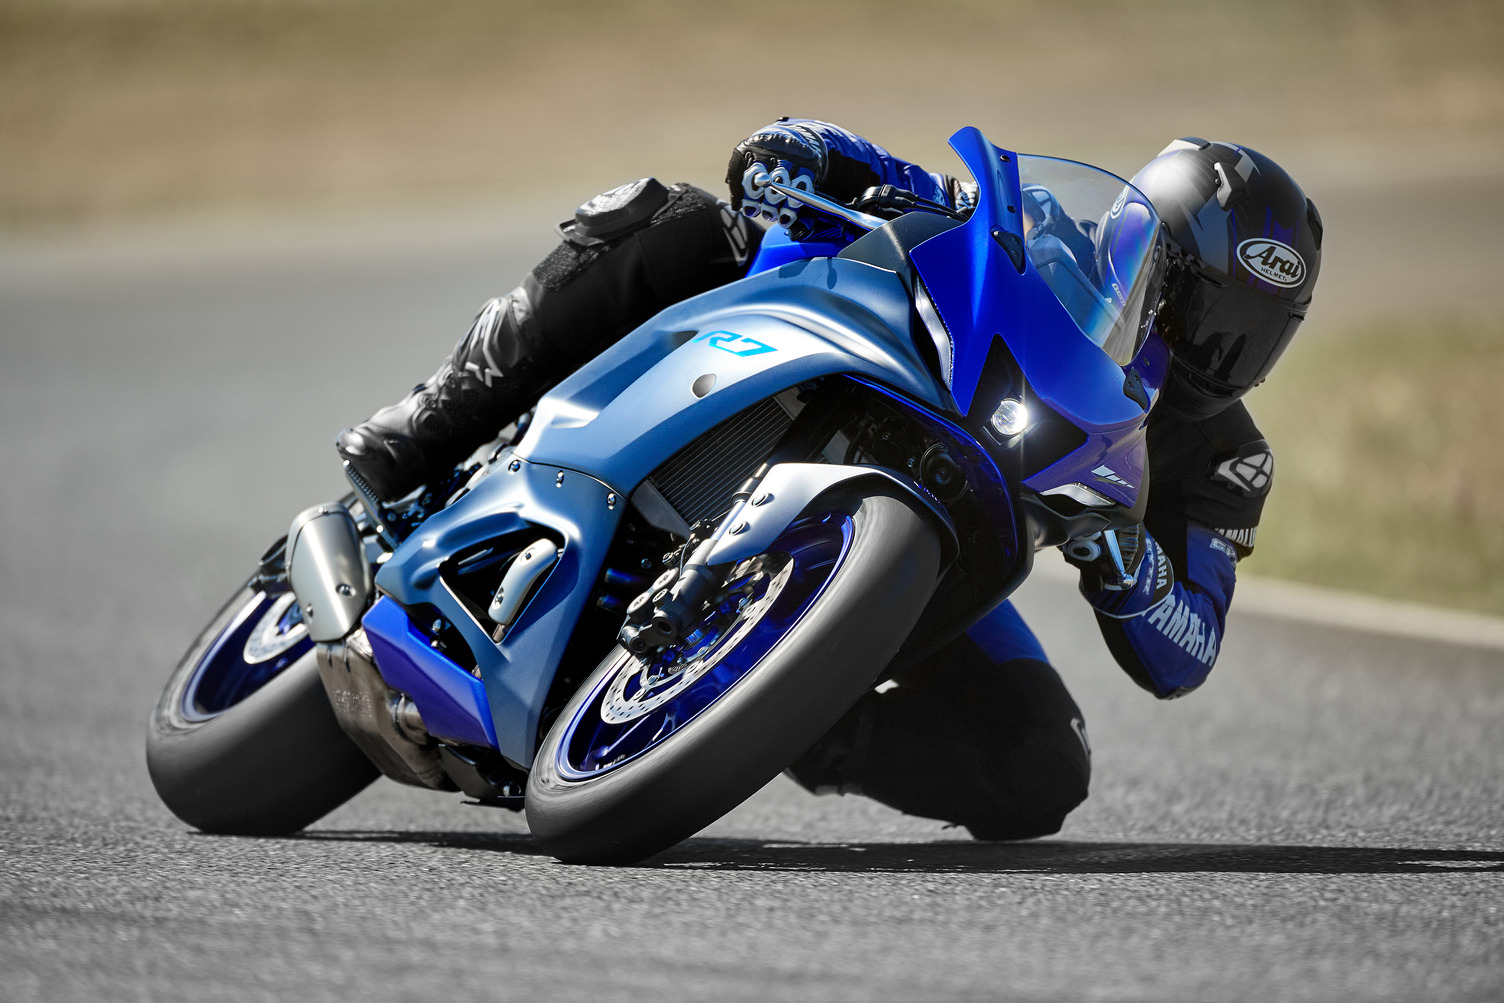 2022 YZF-R7 Supersport (3)